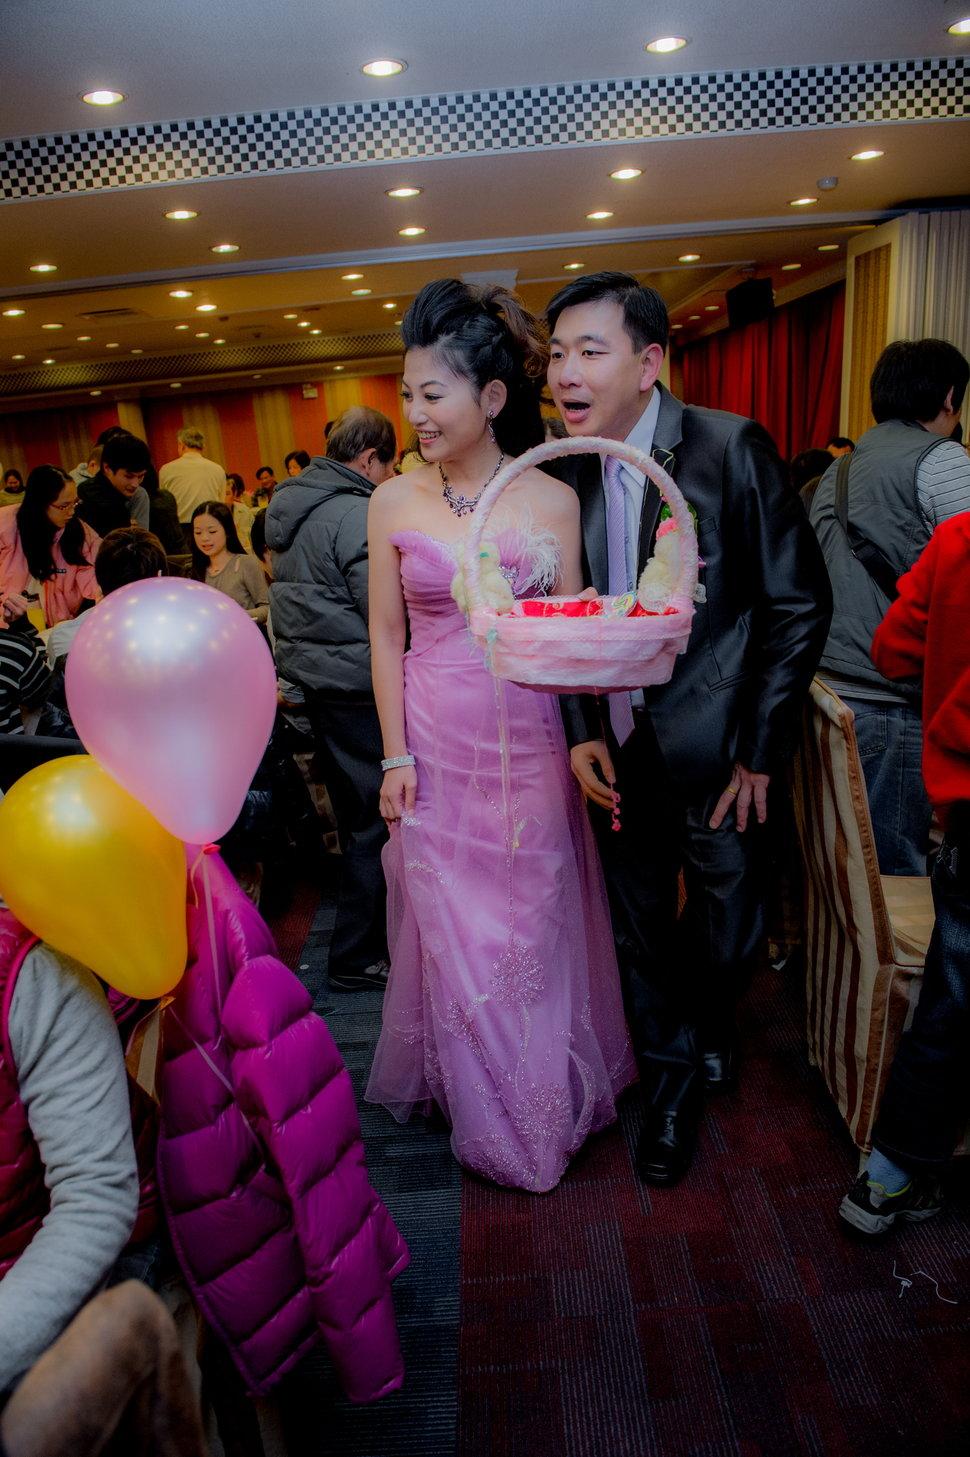 _CON9191 - 婚攝溏威自助婚紗婚禮紀錄新秘孕寫真全家福《結婚吧》